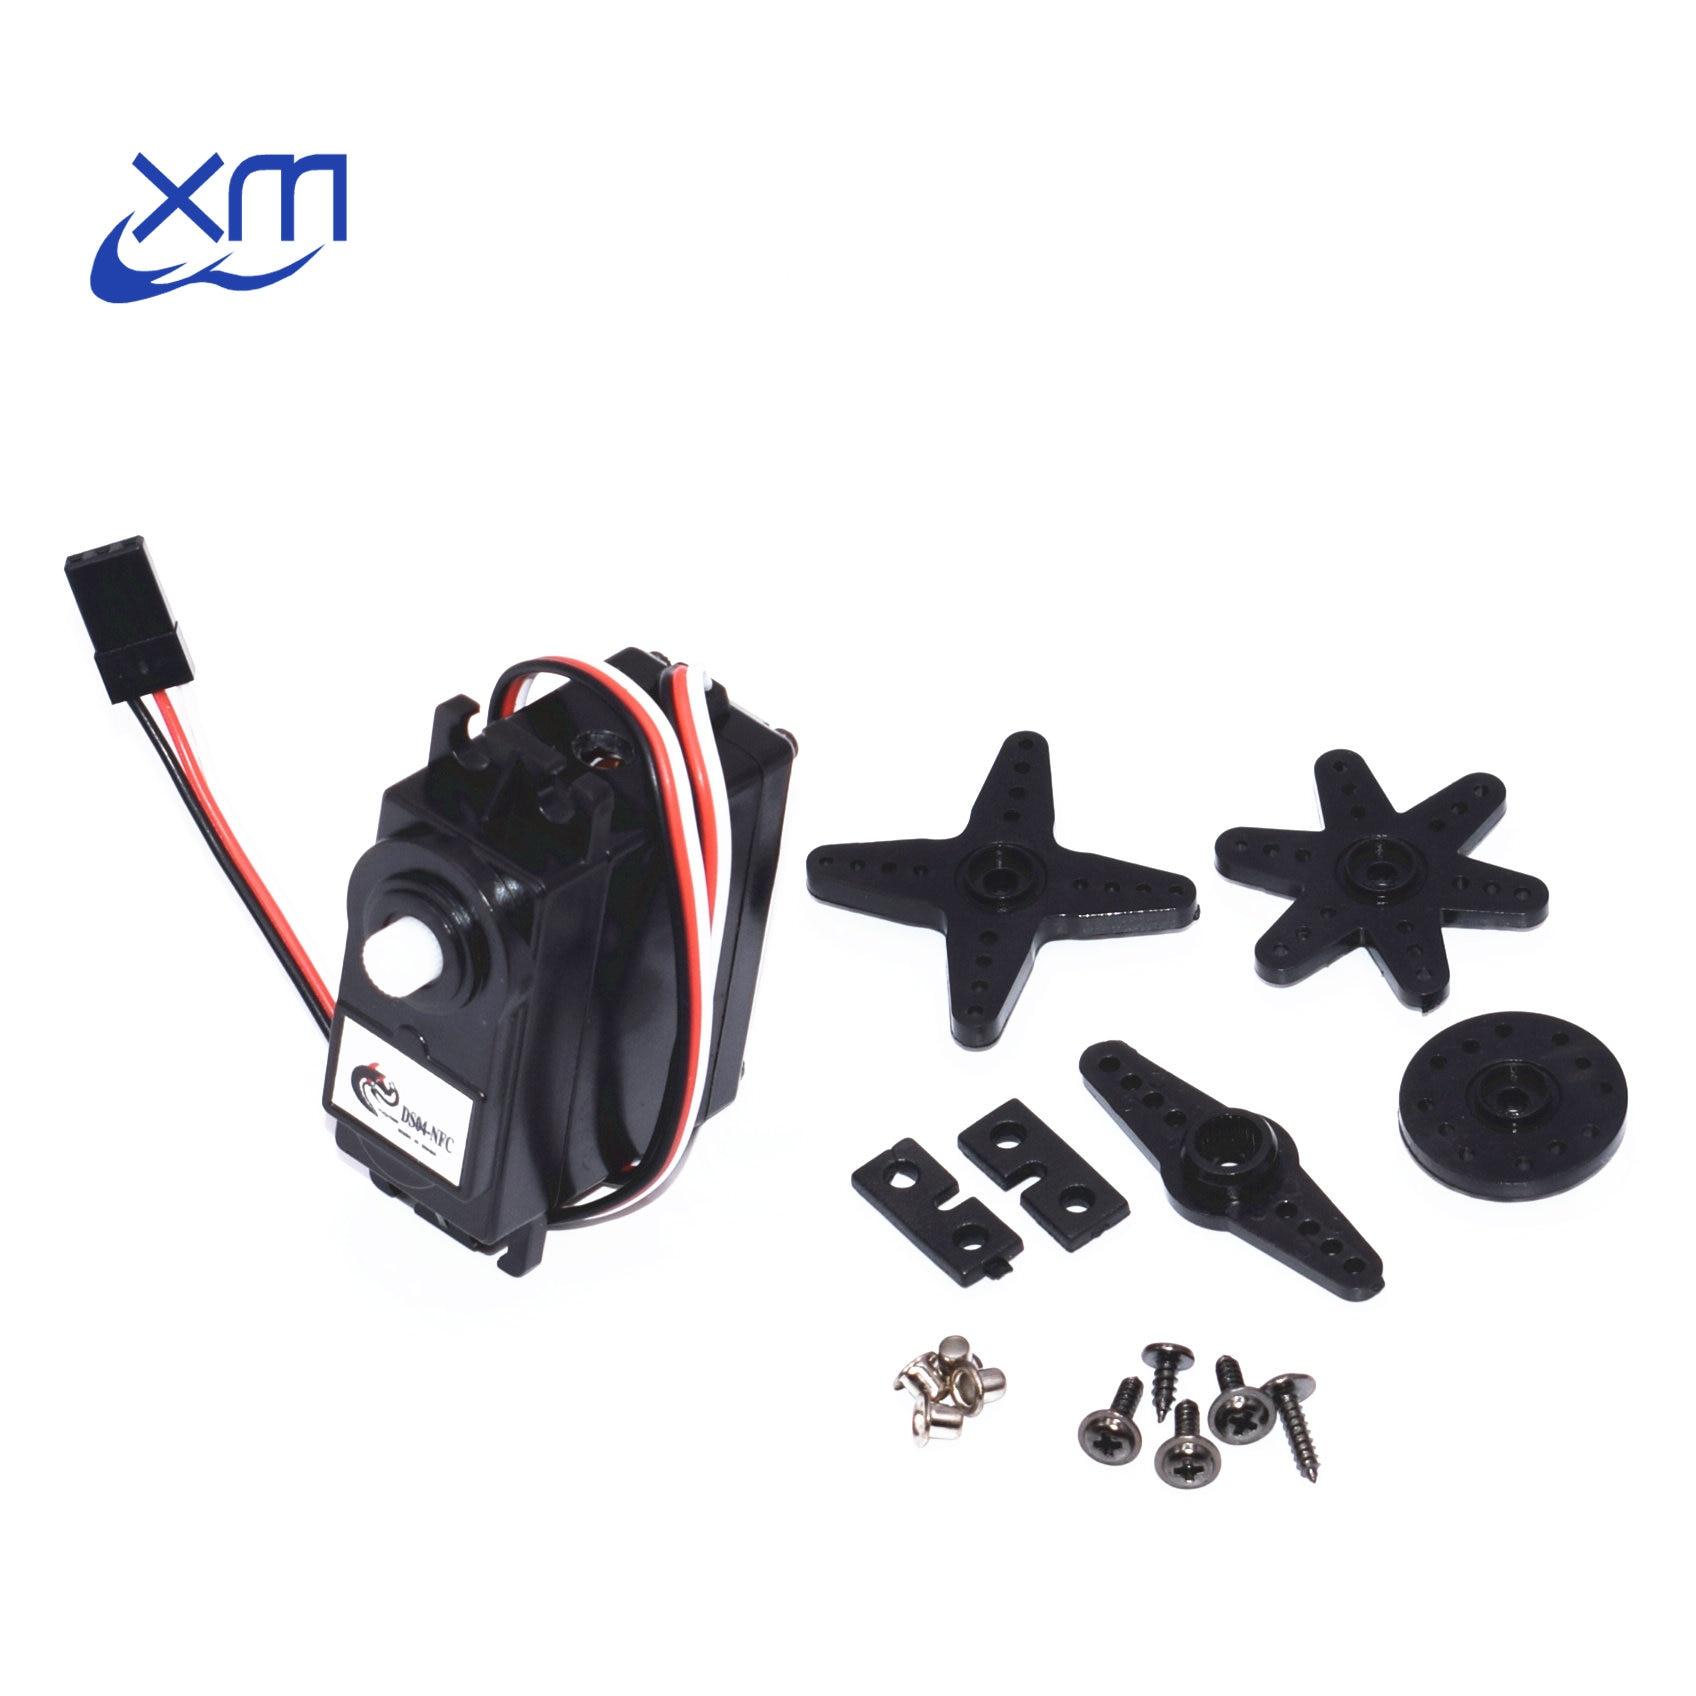 10pcs/lot DS04-NFC servo 360-degree Continuous Rotation Servos DC Gear Motor Smart Car Robot Torsion 5.5kg/cm DC 4.8V-6V H44